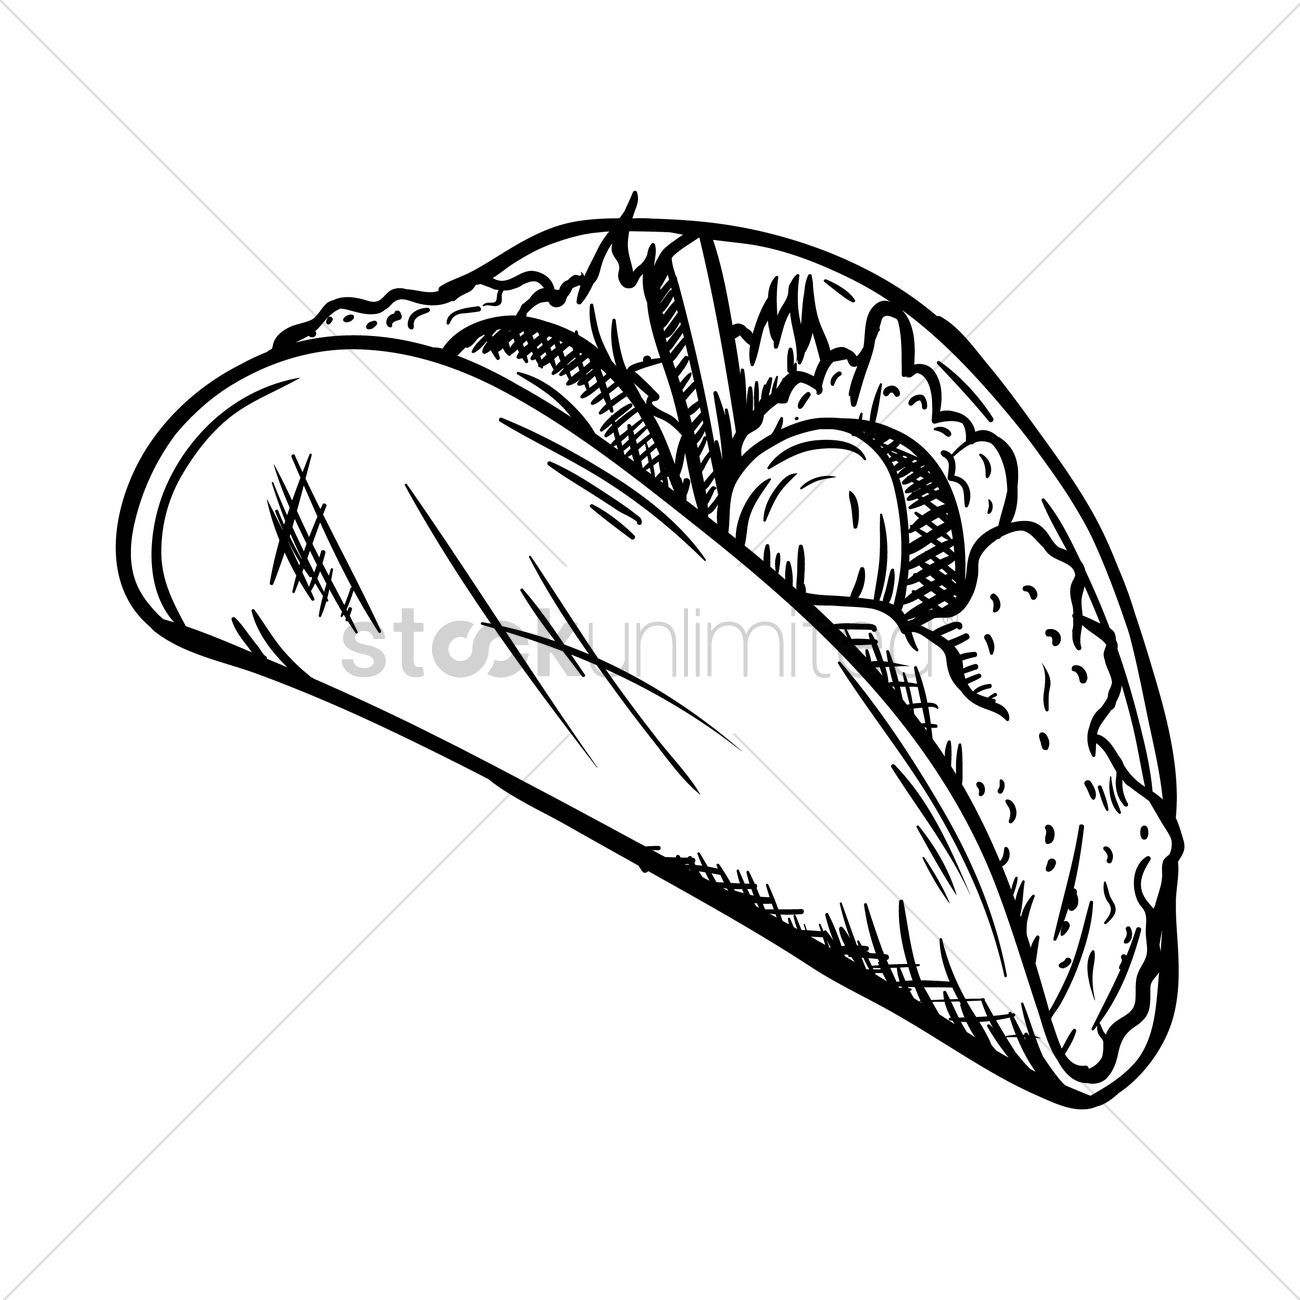 1300x1300 Tacos Vector Image